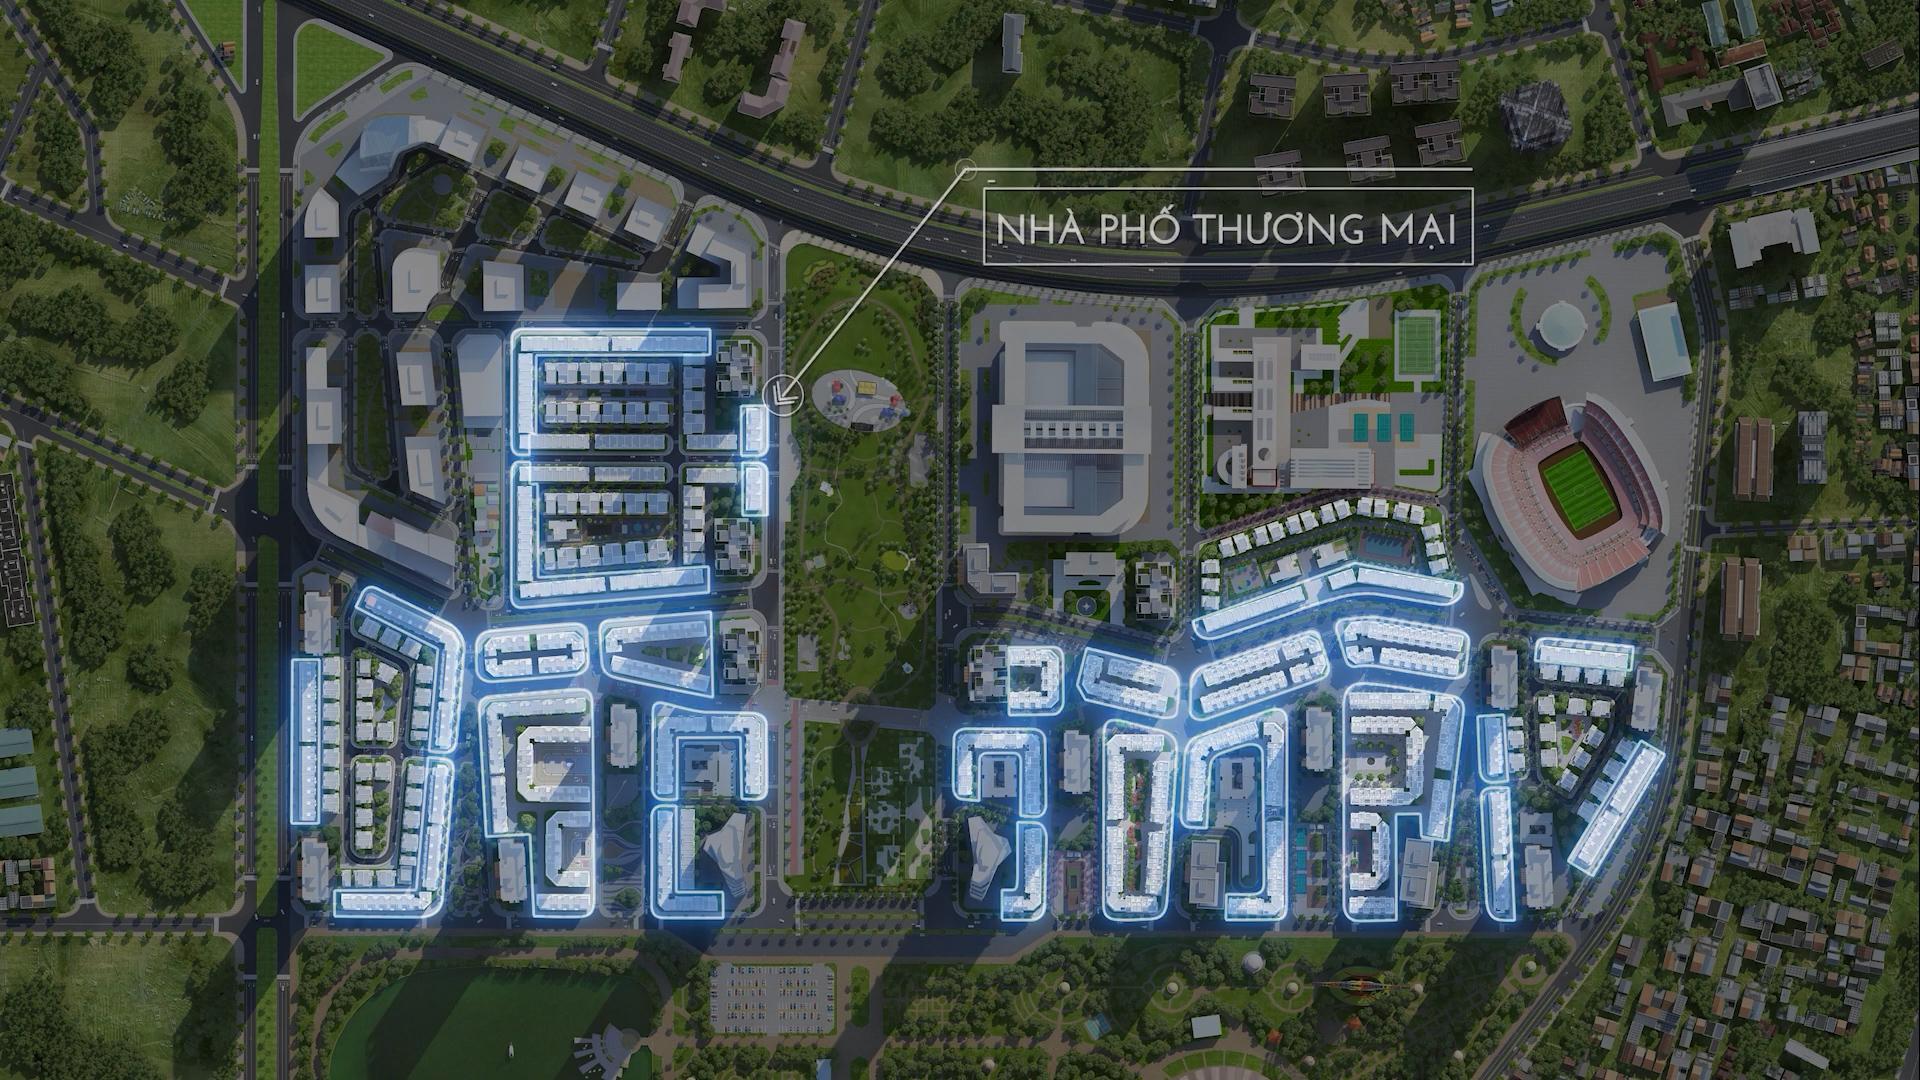 Nha pho thuong mai the manor central park - Trang chủ